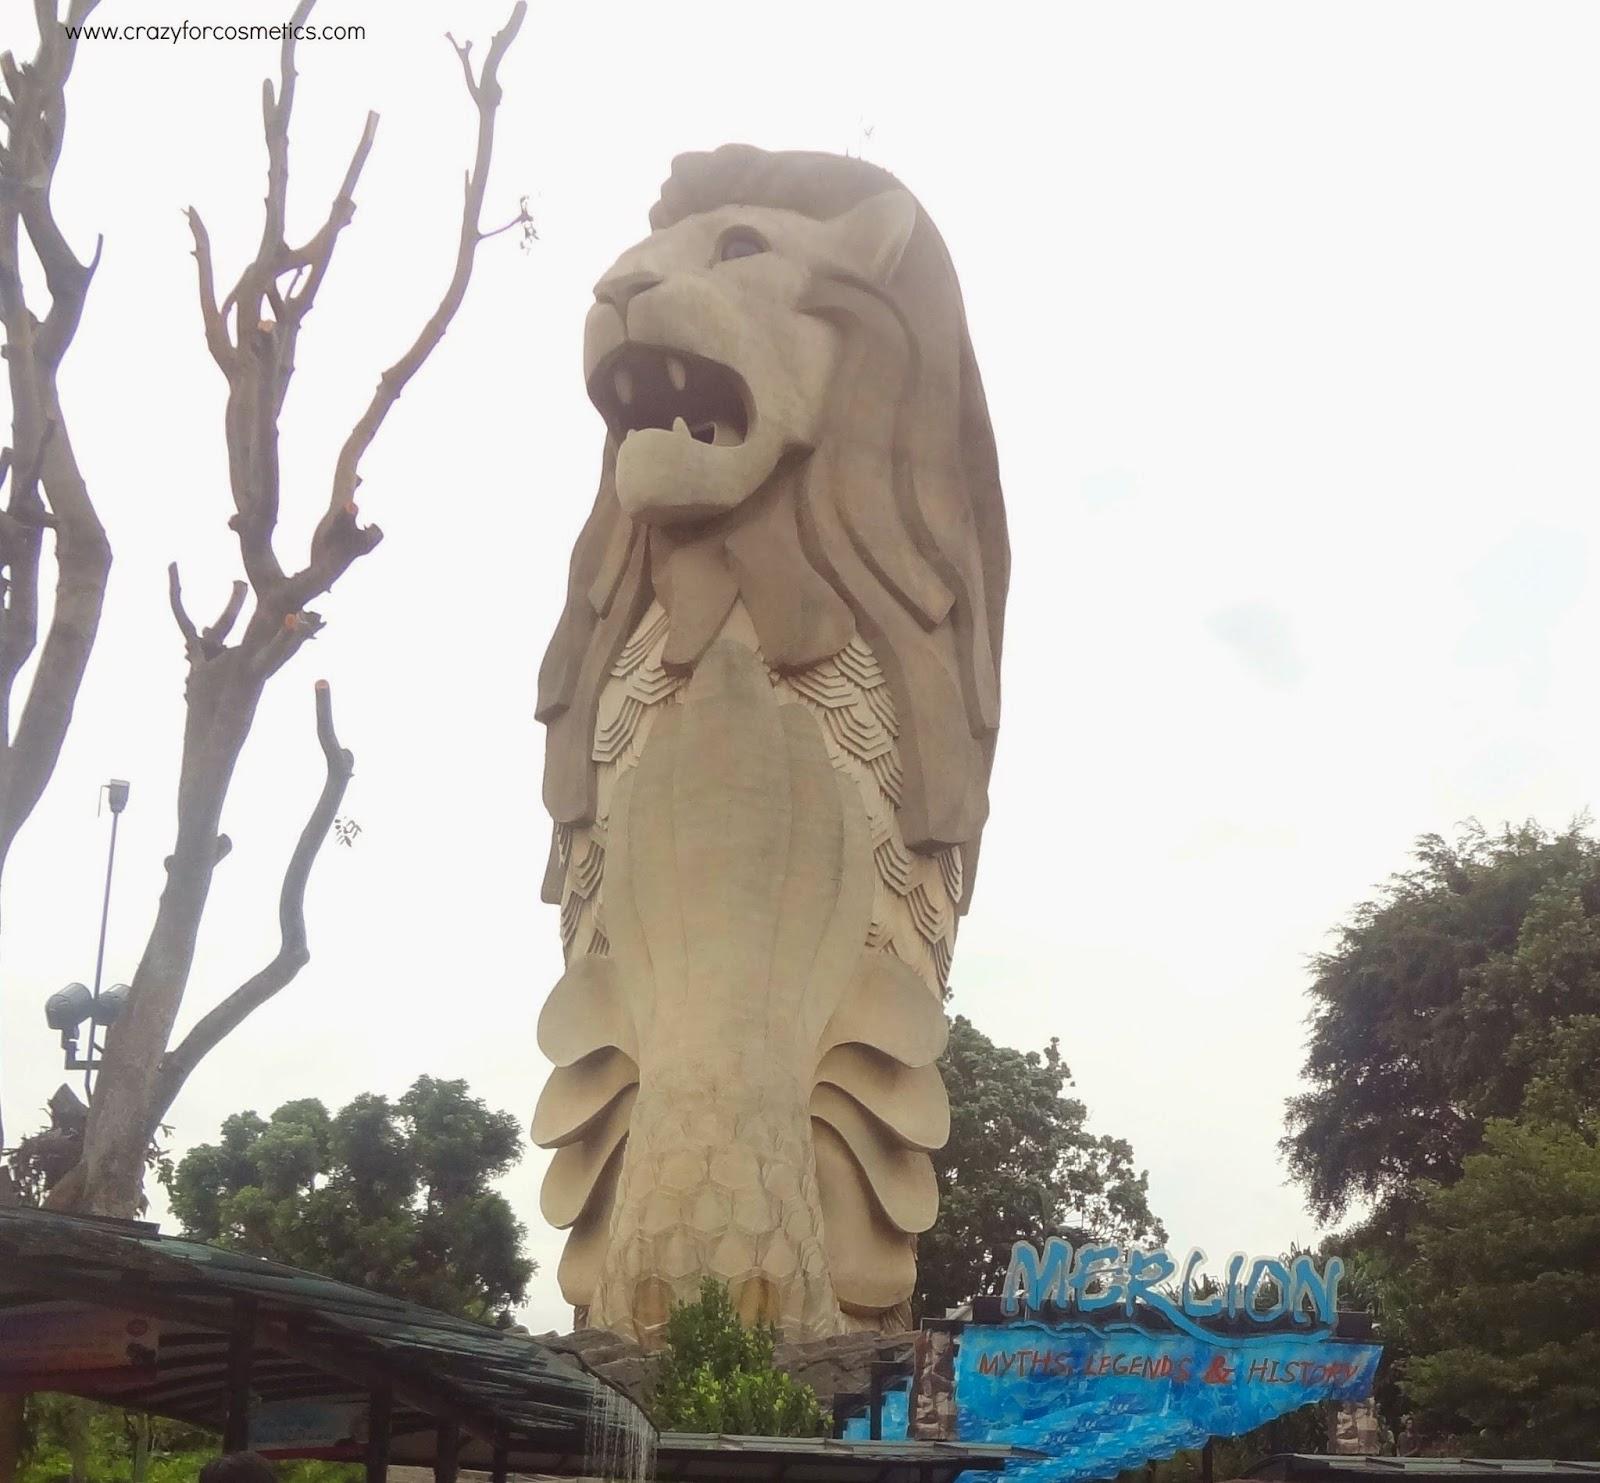 sentosa island Singapore- sentosa island Singapore attractions- sentosa island package- sentosa island adventure cove- sentosa island Merlion- sentosa island dolphin show- sentosa island skyline luge- sentosa island water park